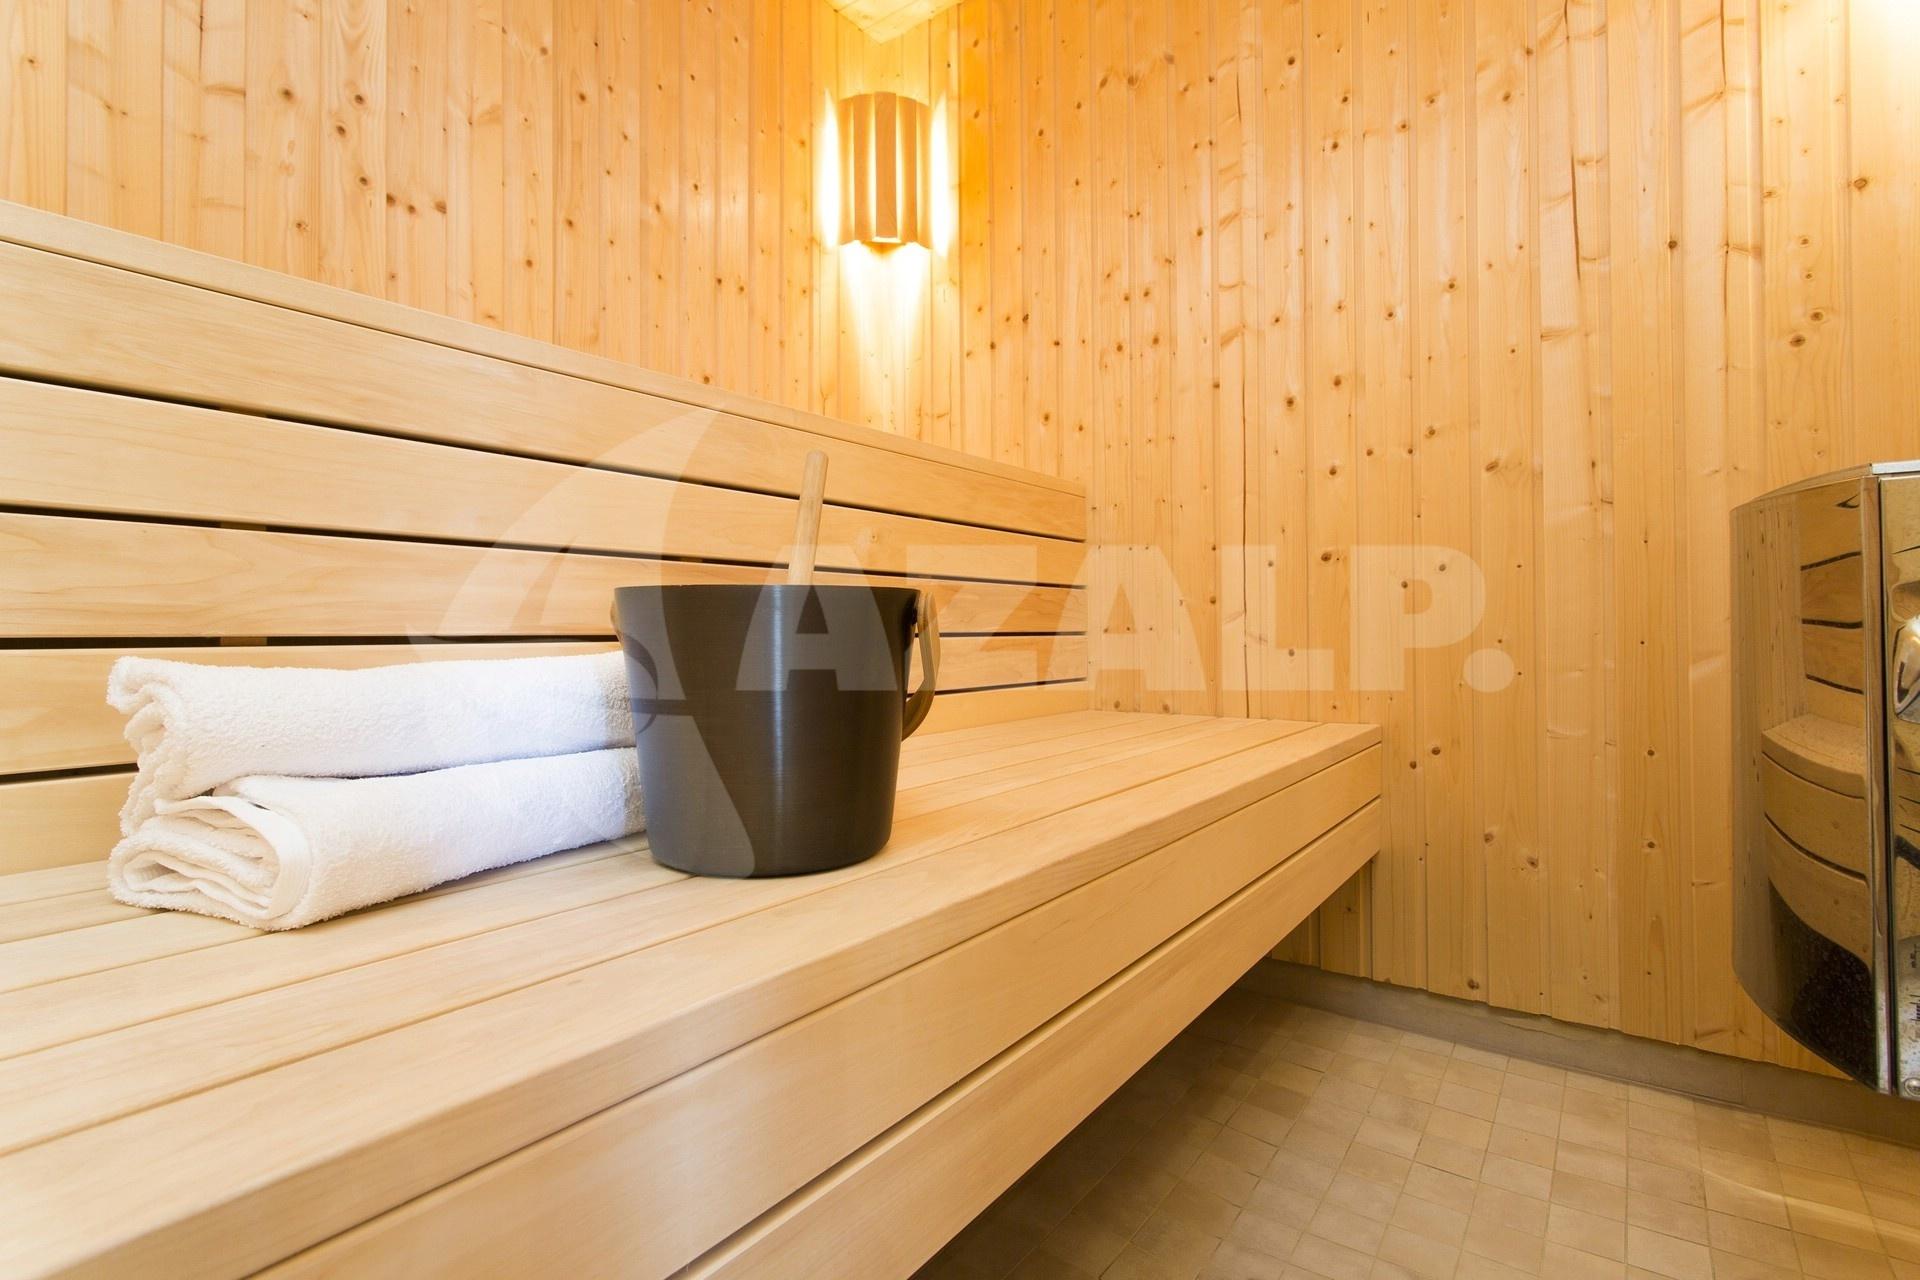 Azalp Mehrpreis Abachi Saunabänke anstatt Erle Kaufen bei Azalp.de